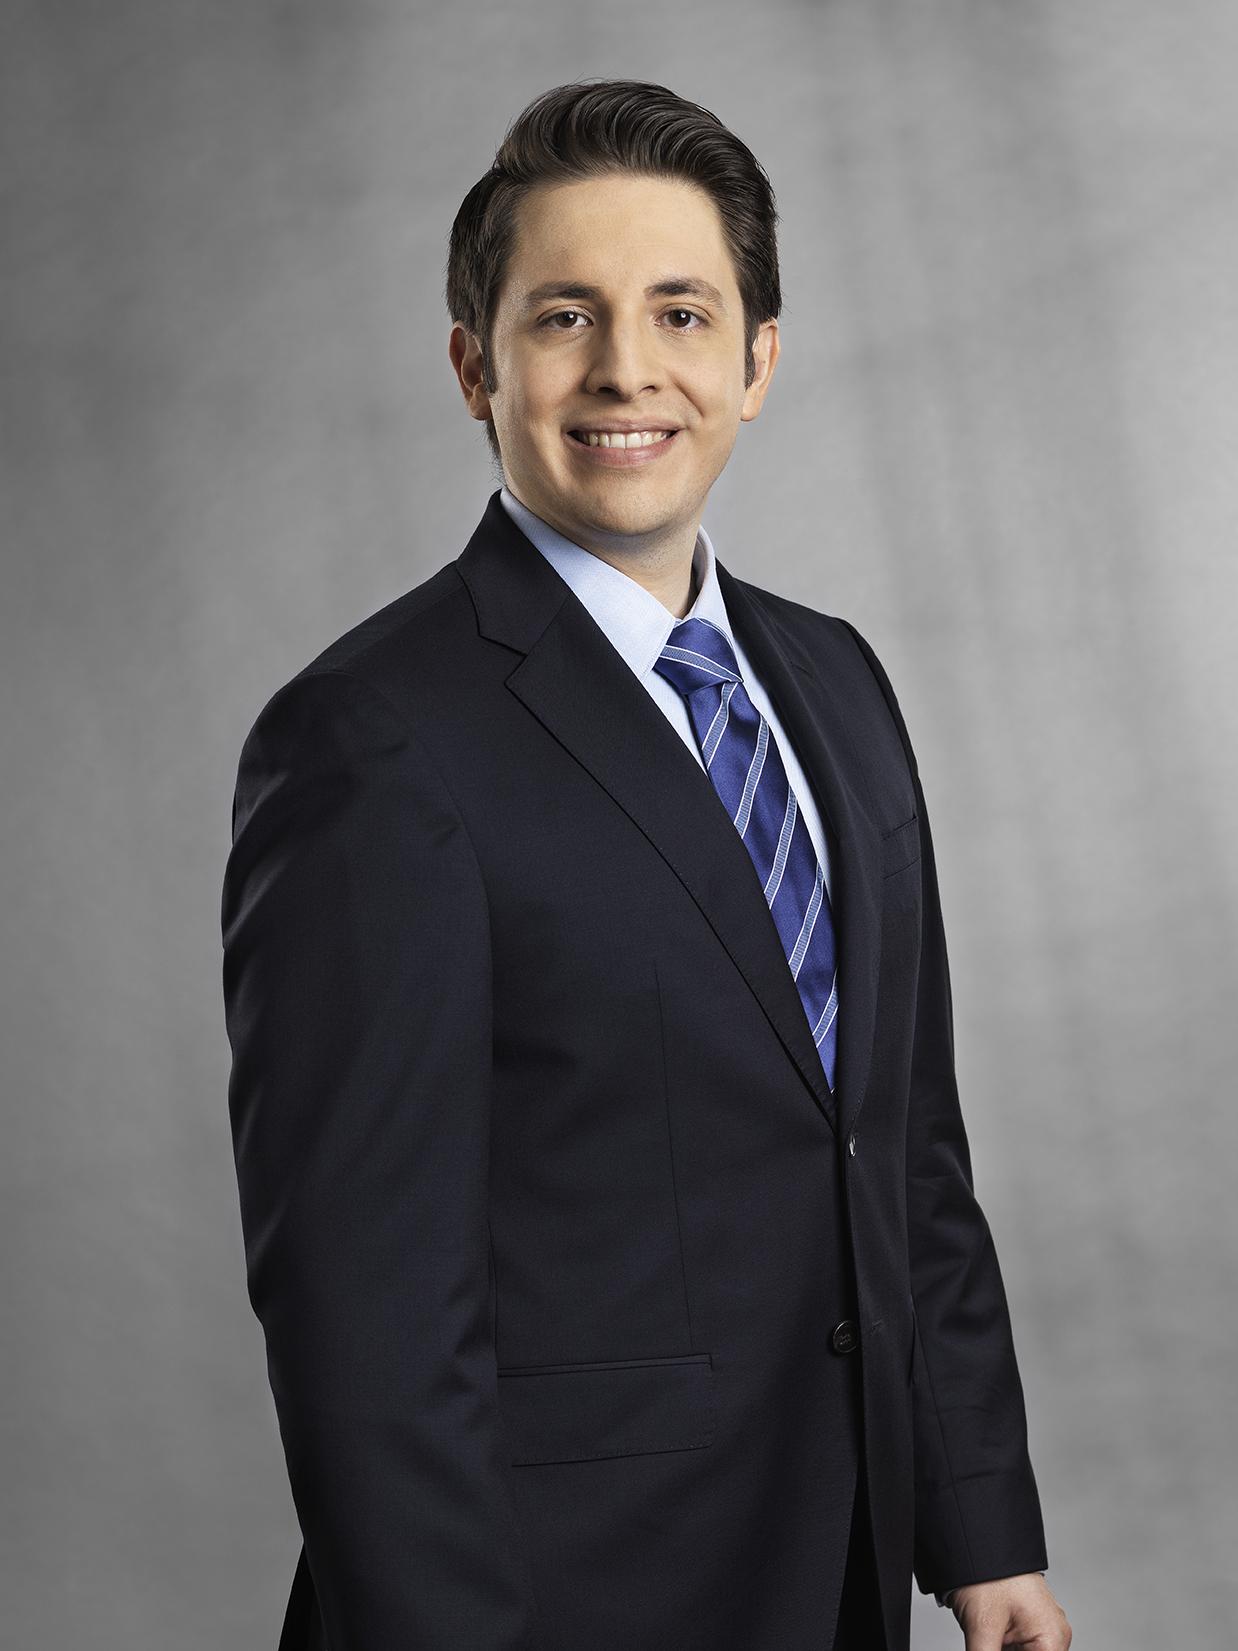 Richard M. Meyer